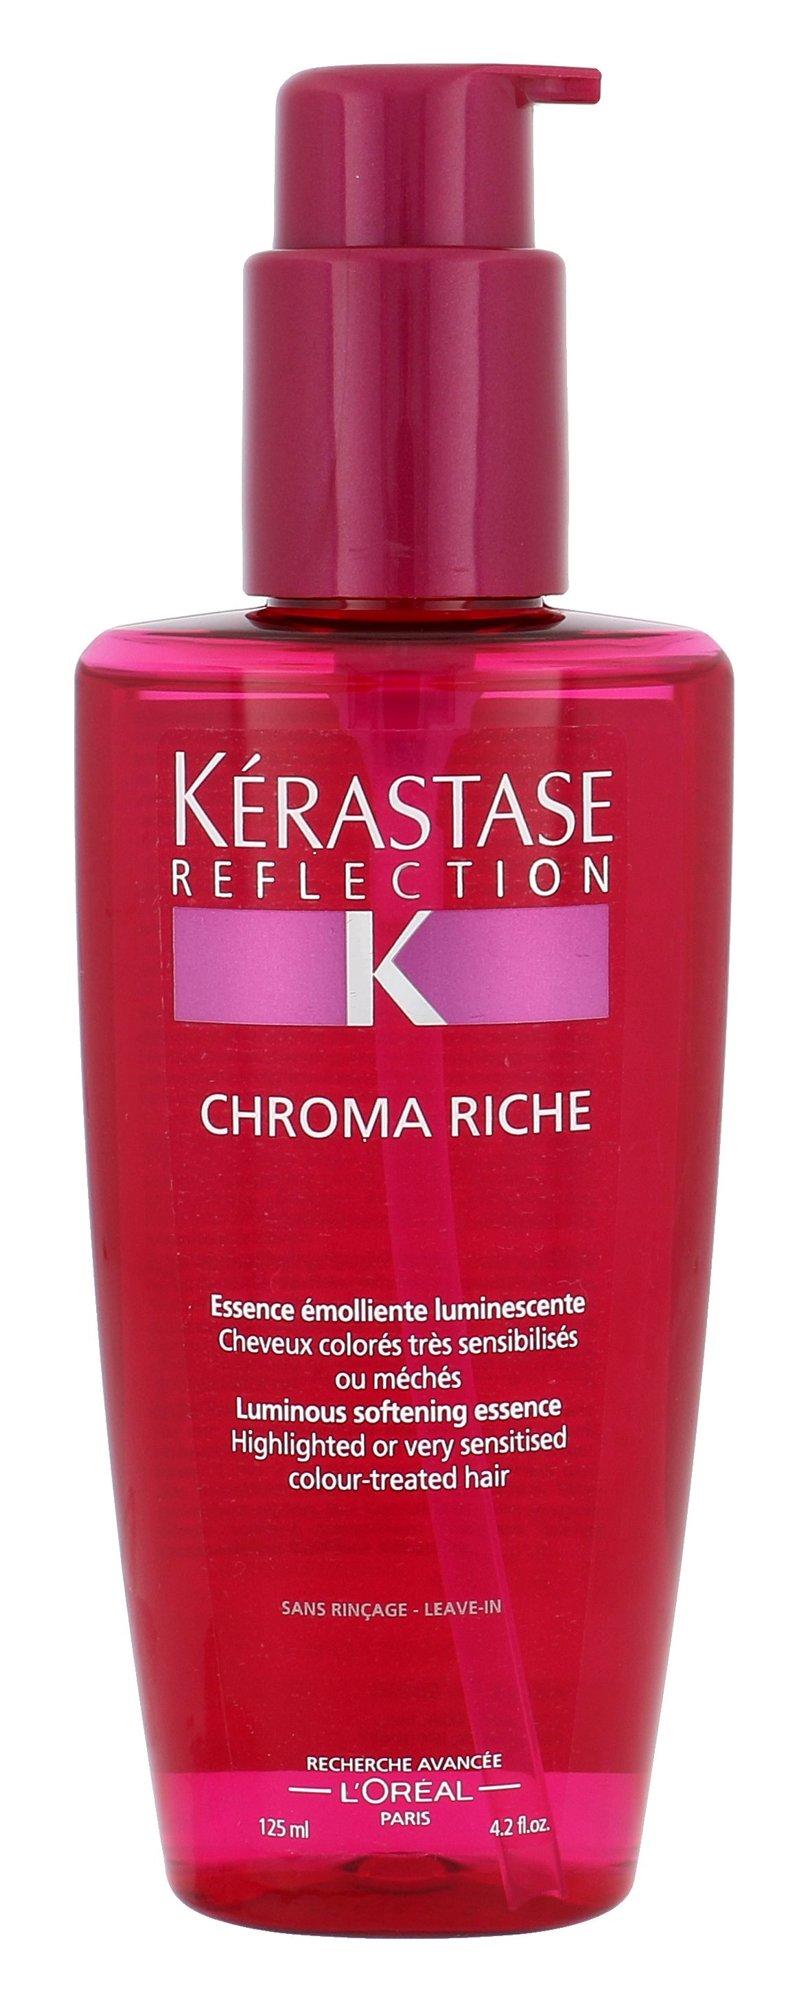 Kérastase Réflection Cosmetic 125ml